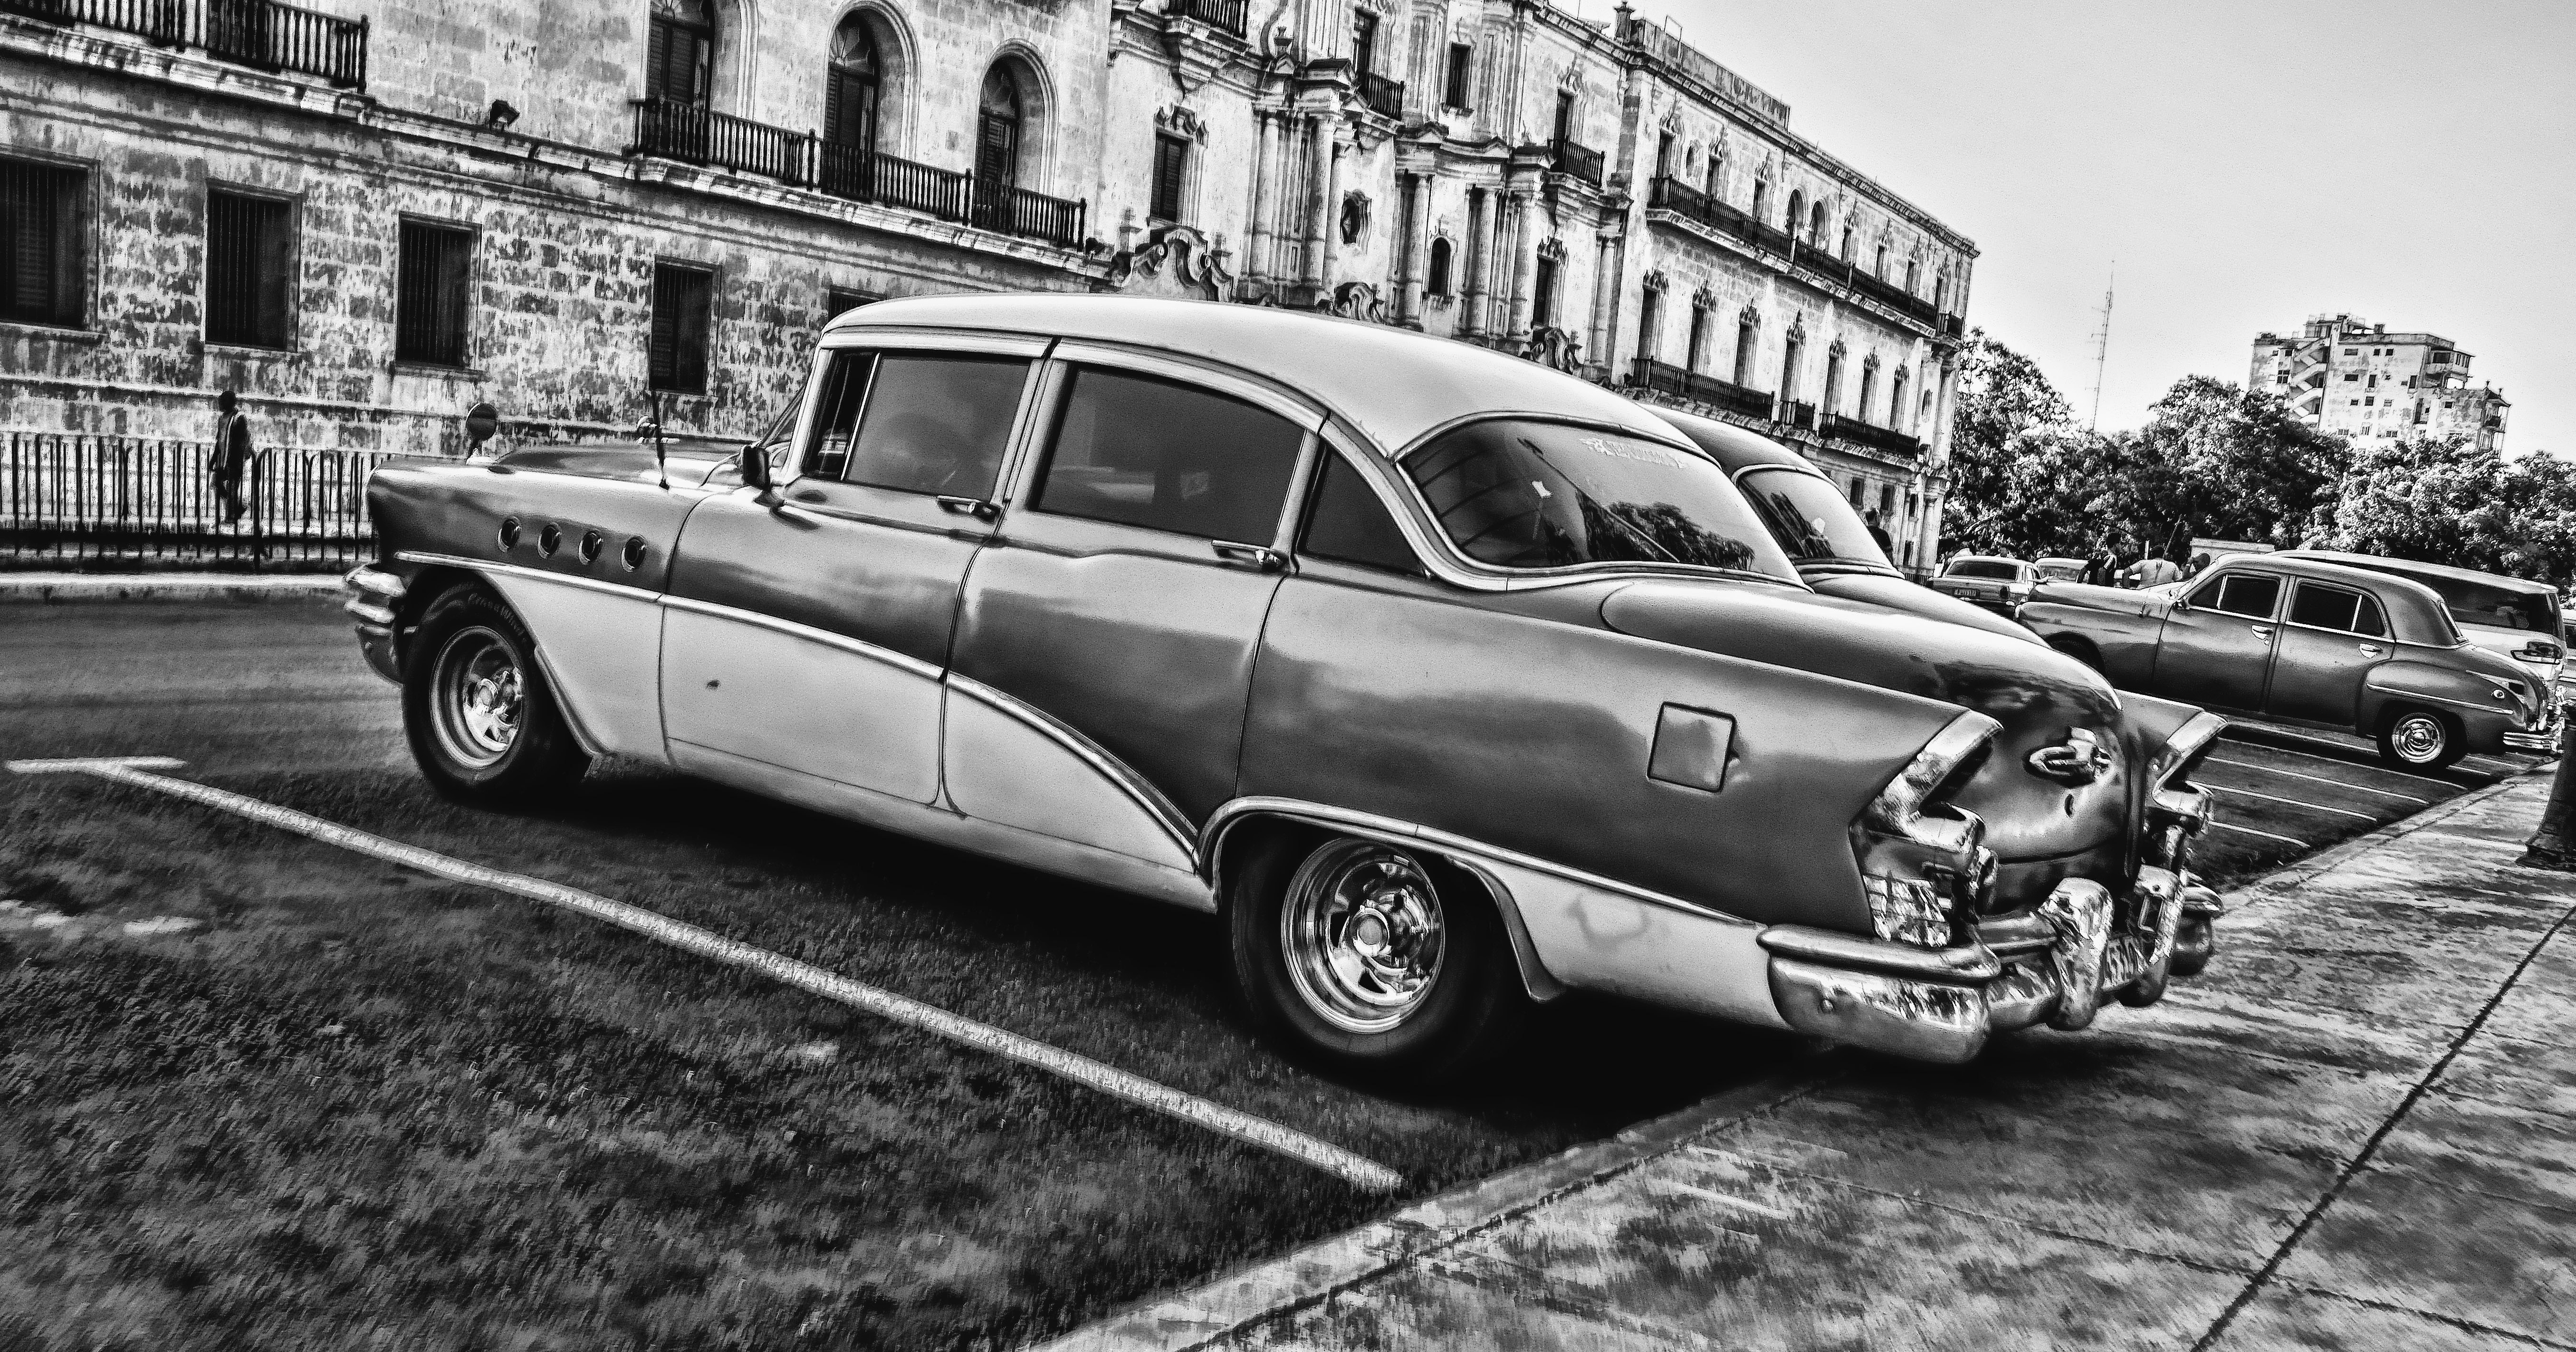 Greyscale Photo of Vintage Car Parked Beside Building, Asphalt, Pavement, Vintage, Vehicles, HQ Photo